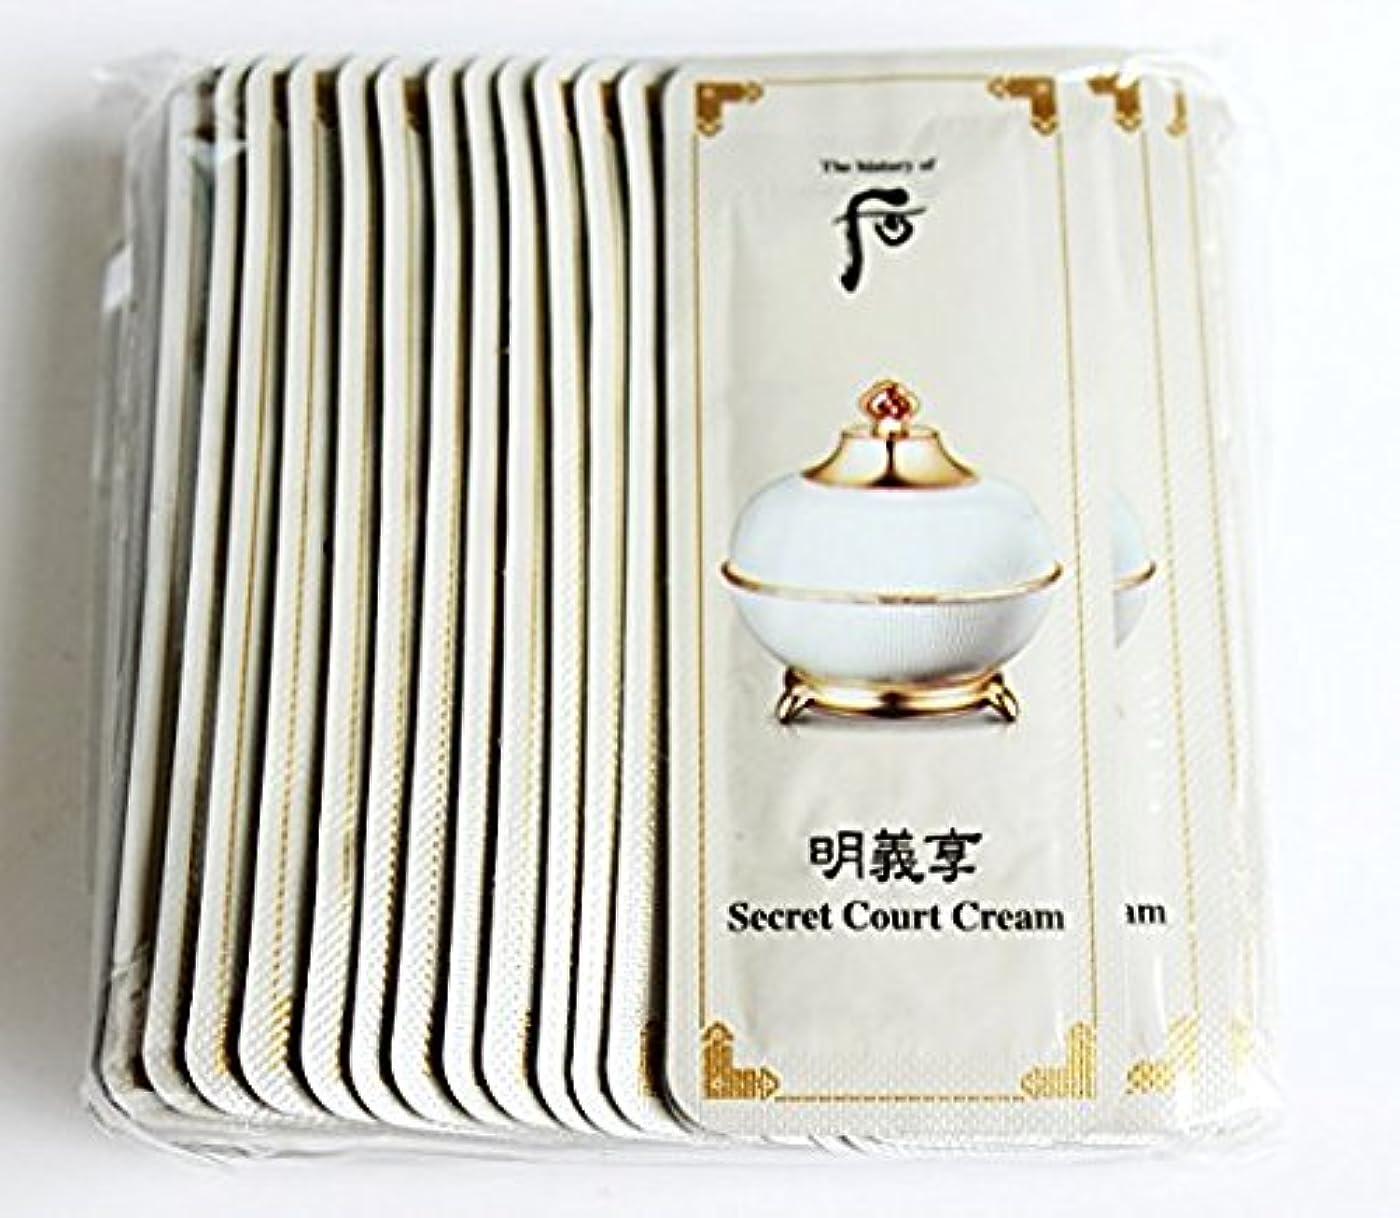 The History of Whoo Myeonguihyanng Secret Court Cream [Sample 1ml × 30ea]/ザ ヒストリー オブ フー(后) 明義享 シークレット コート クリーム...